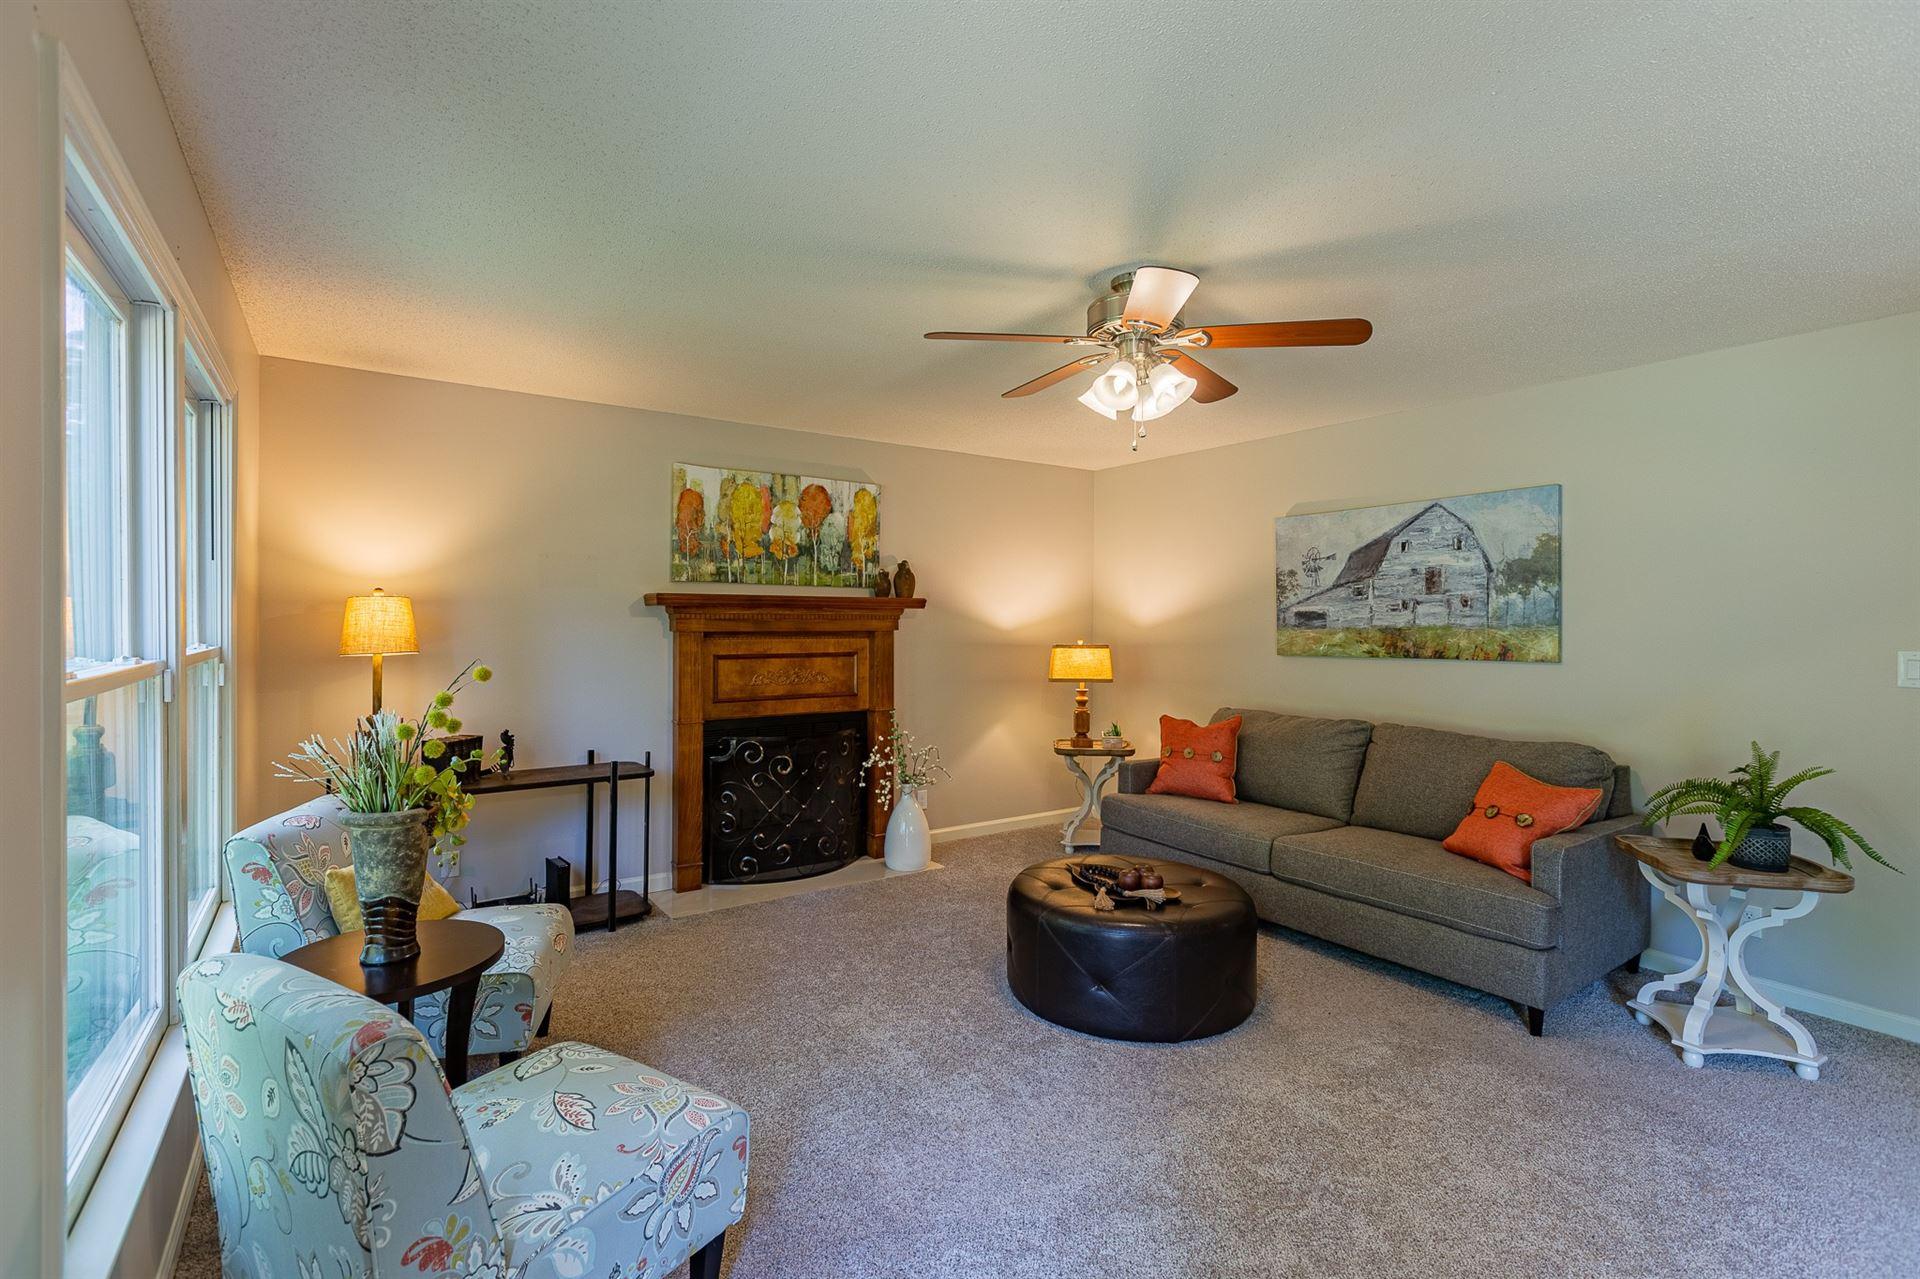 1441 Pitty Pat Rd, Clarksville, TN 37042 - MLS#: 2252796